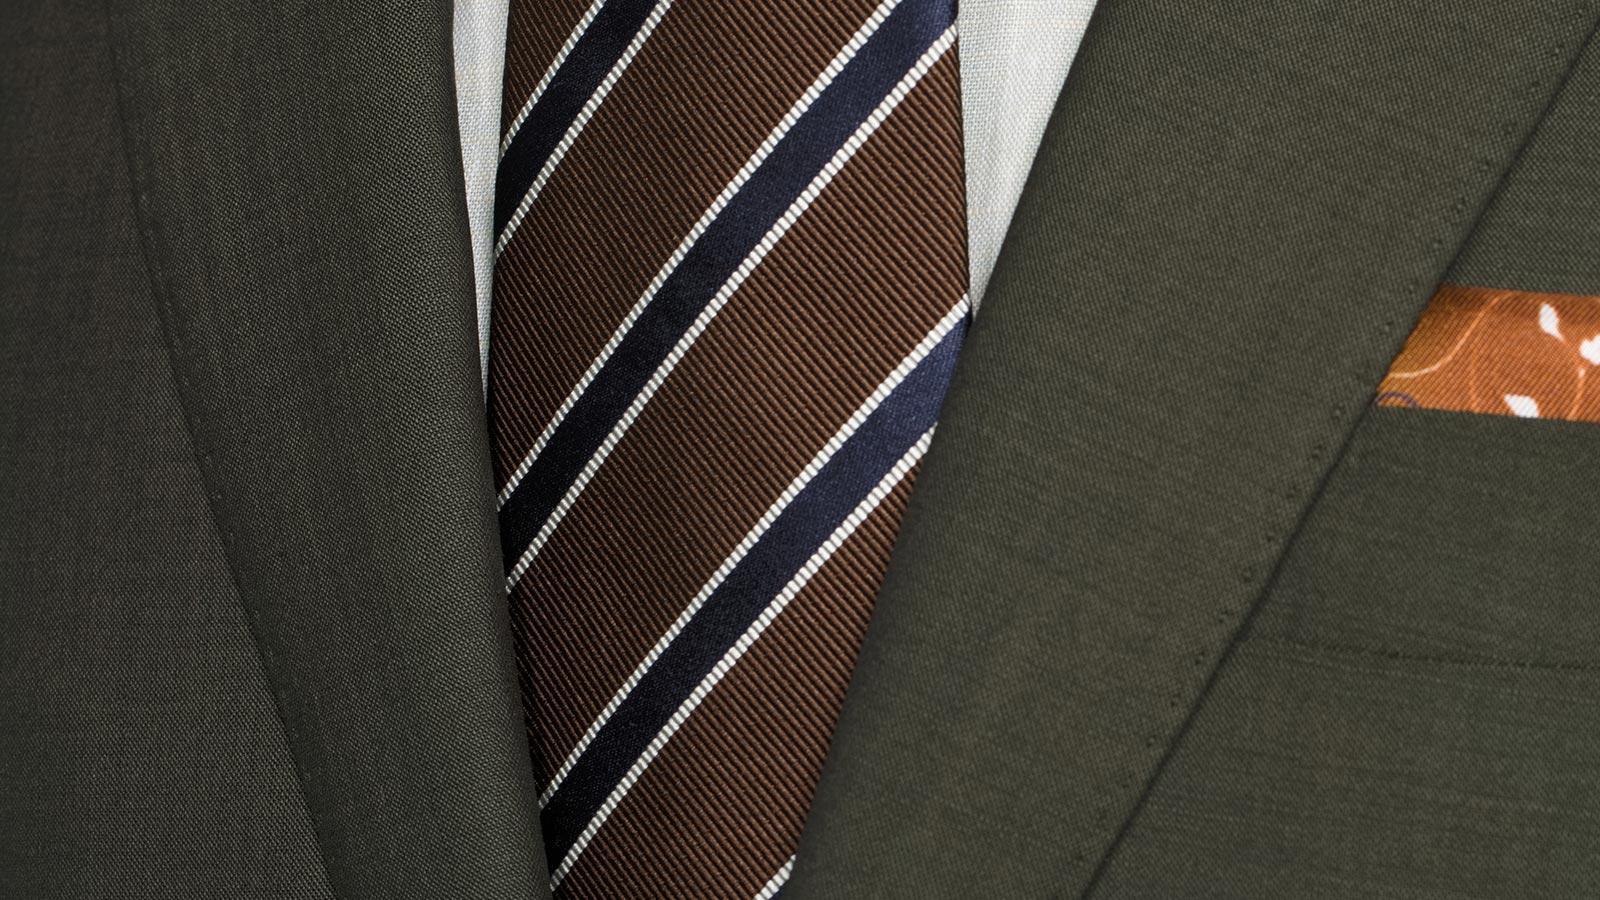 Solid Dark Green Bi-Stretch Suit - slider image 1